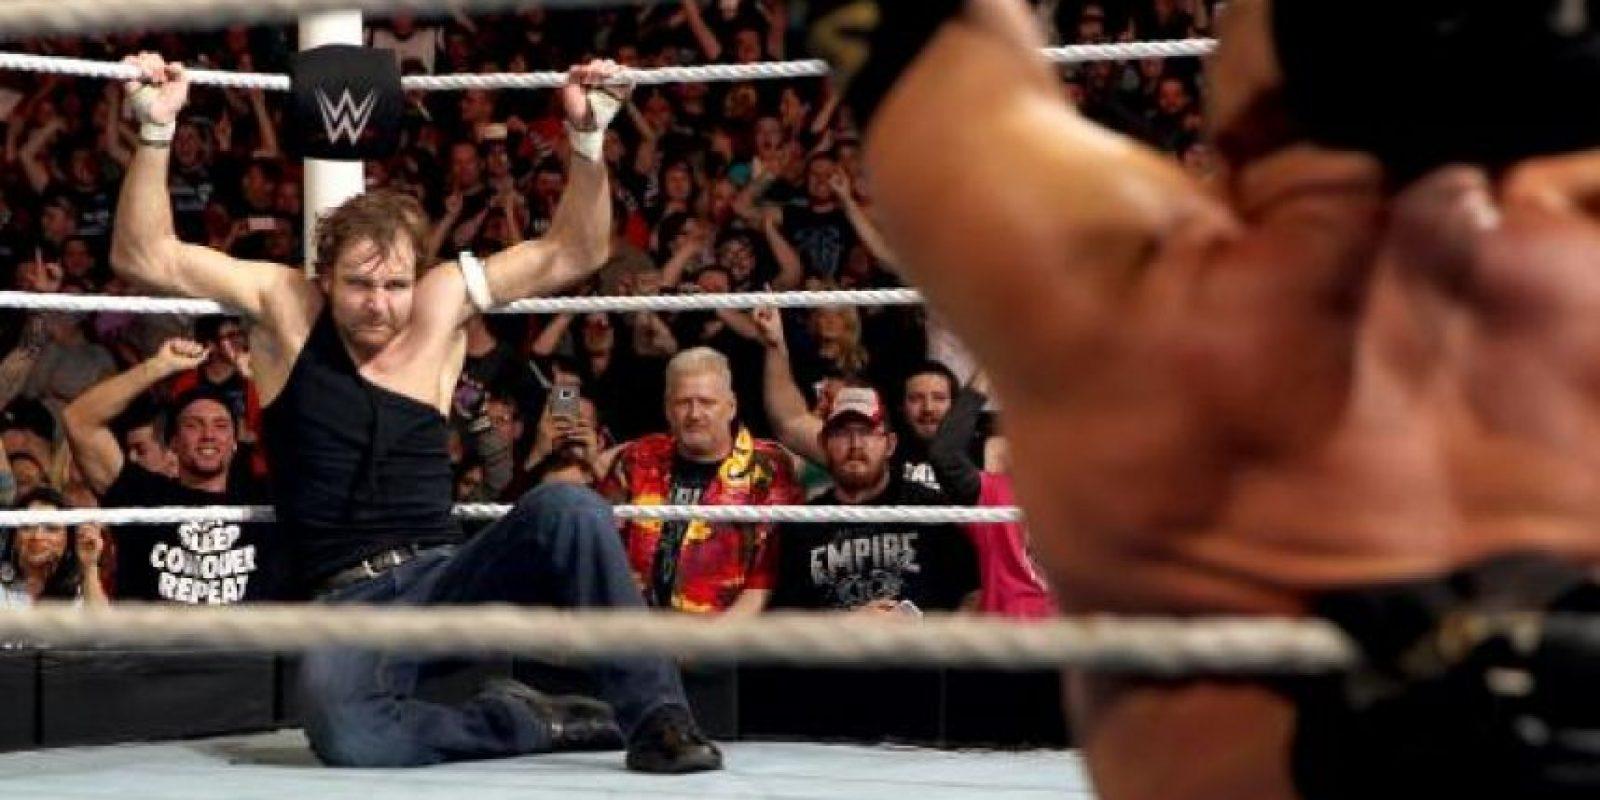 Y al final, superó a Dean Ambrose Foto:WWE